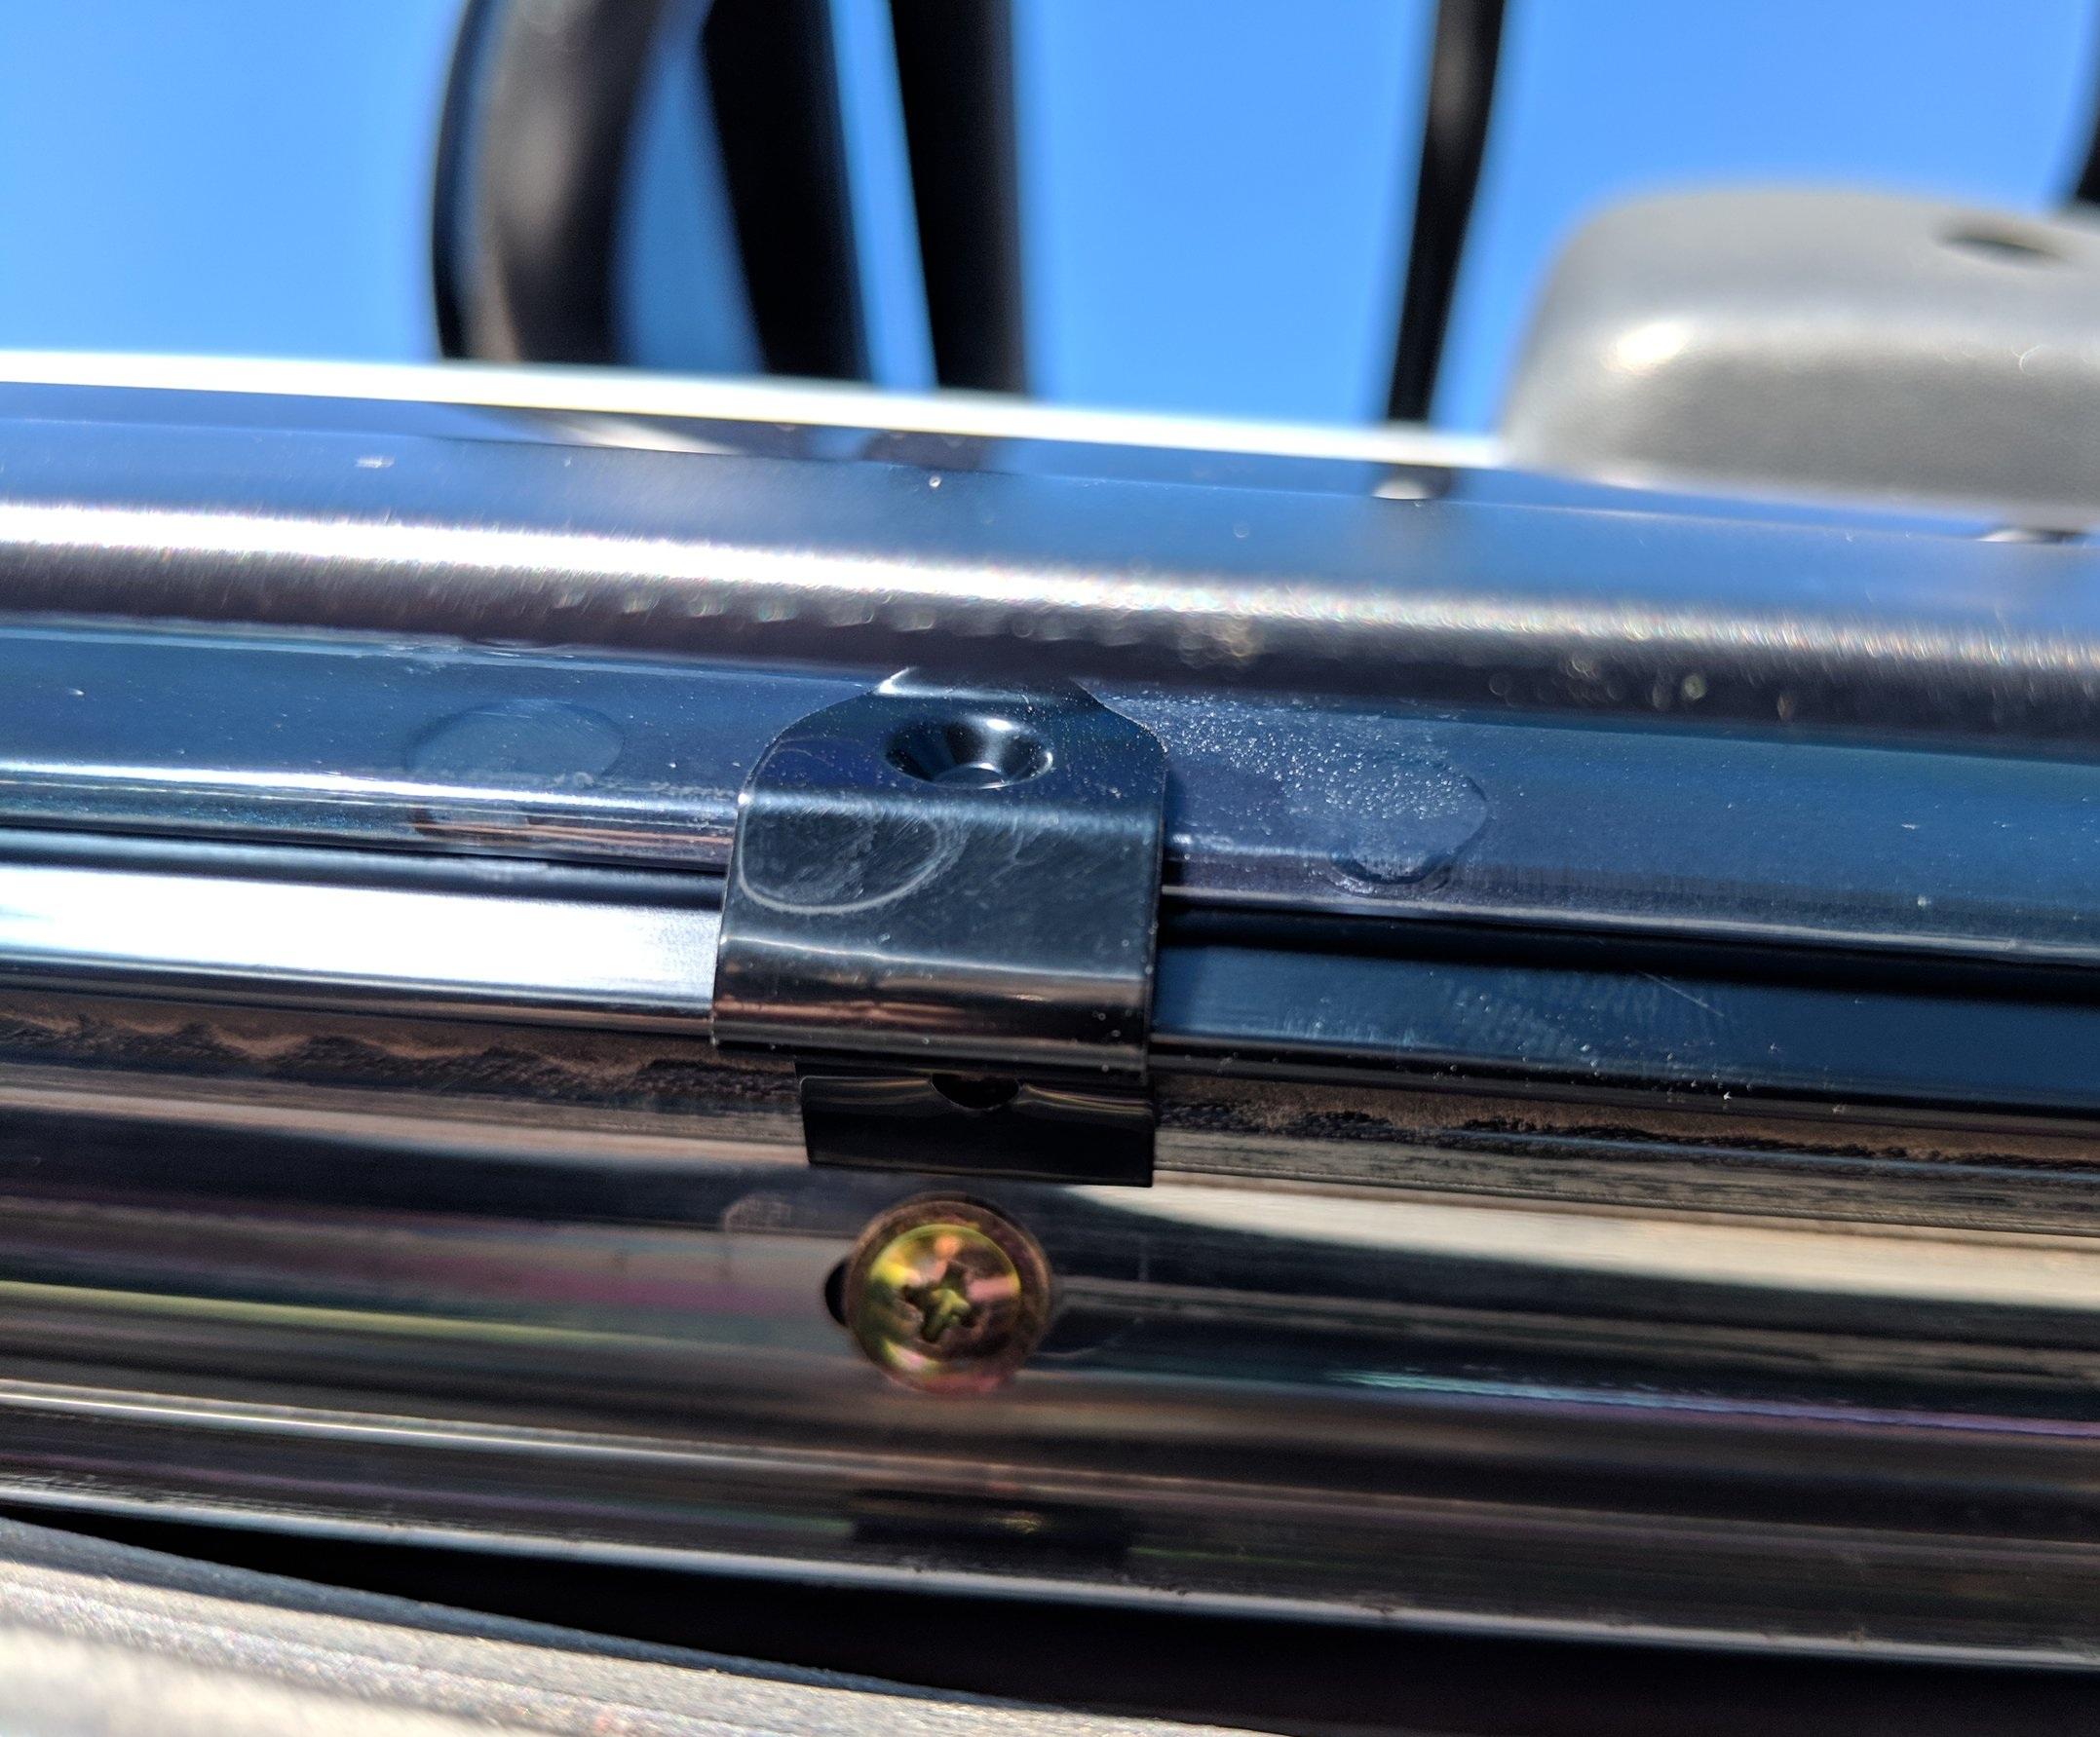 Rear clip in place located near a screw.